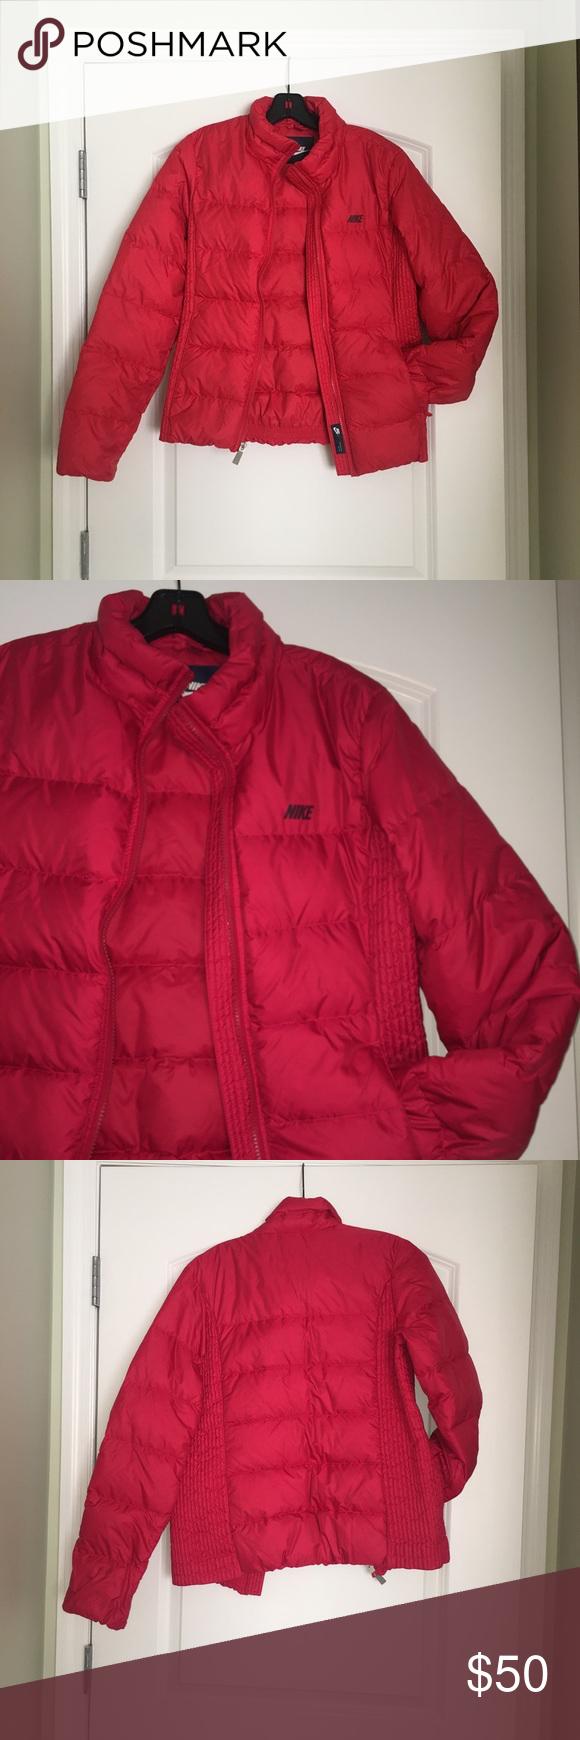 fae82d1a905b Nike Lightweight Bubble Puffer Coat Red Nike lightweight jacket. NWOT.  Never worn. Nike Jackets   Coats Puffers